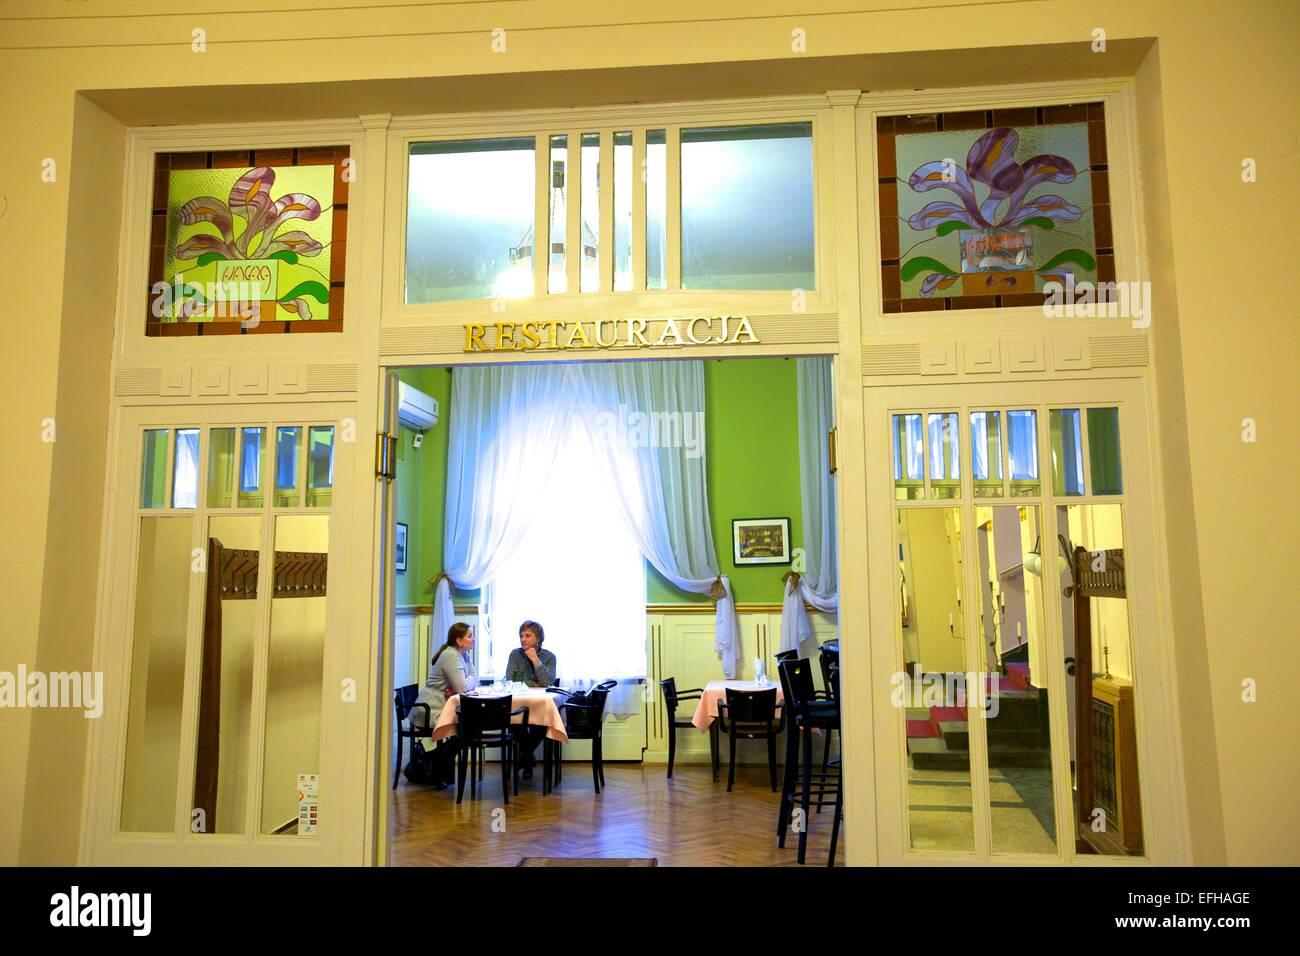 Interior of Klub Garnizonowy, Krakow, Poland, Europe - Stock Image